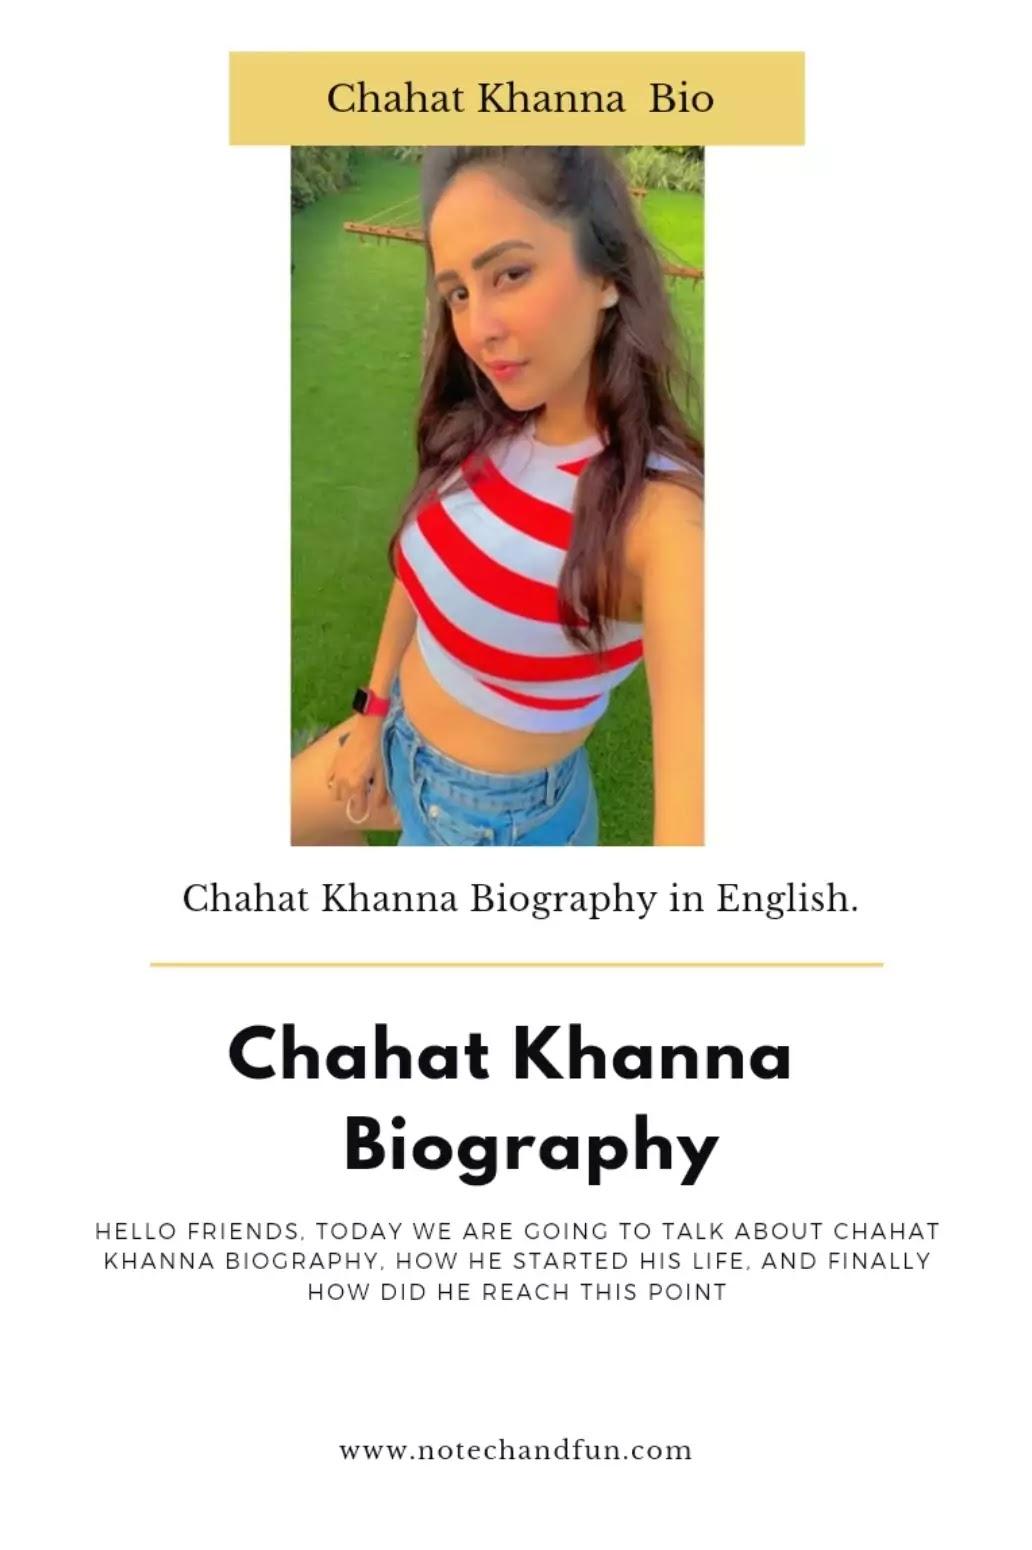 Chahat Khanna Instagram